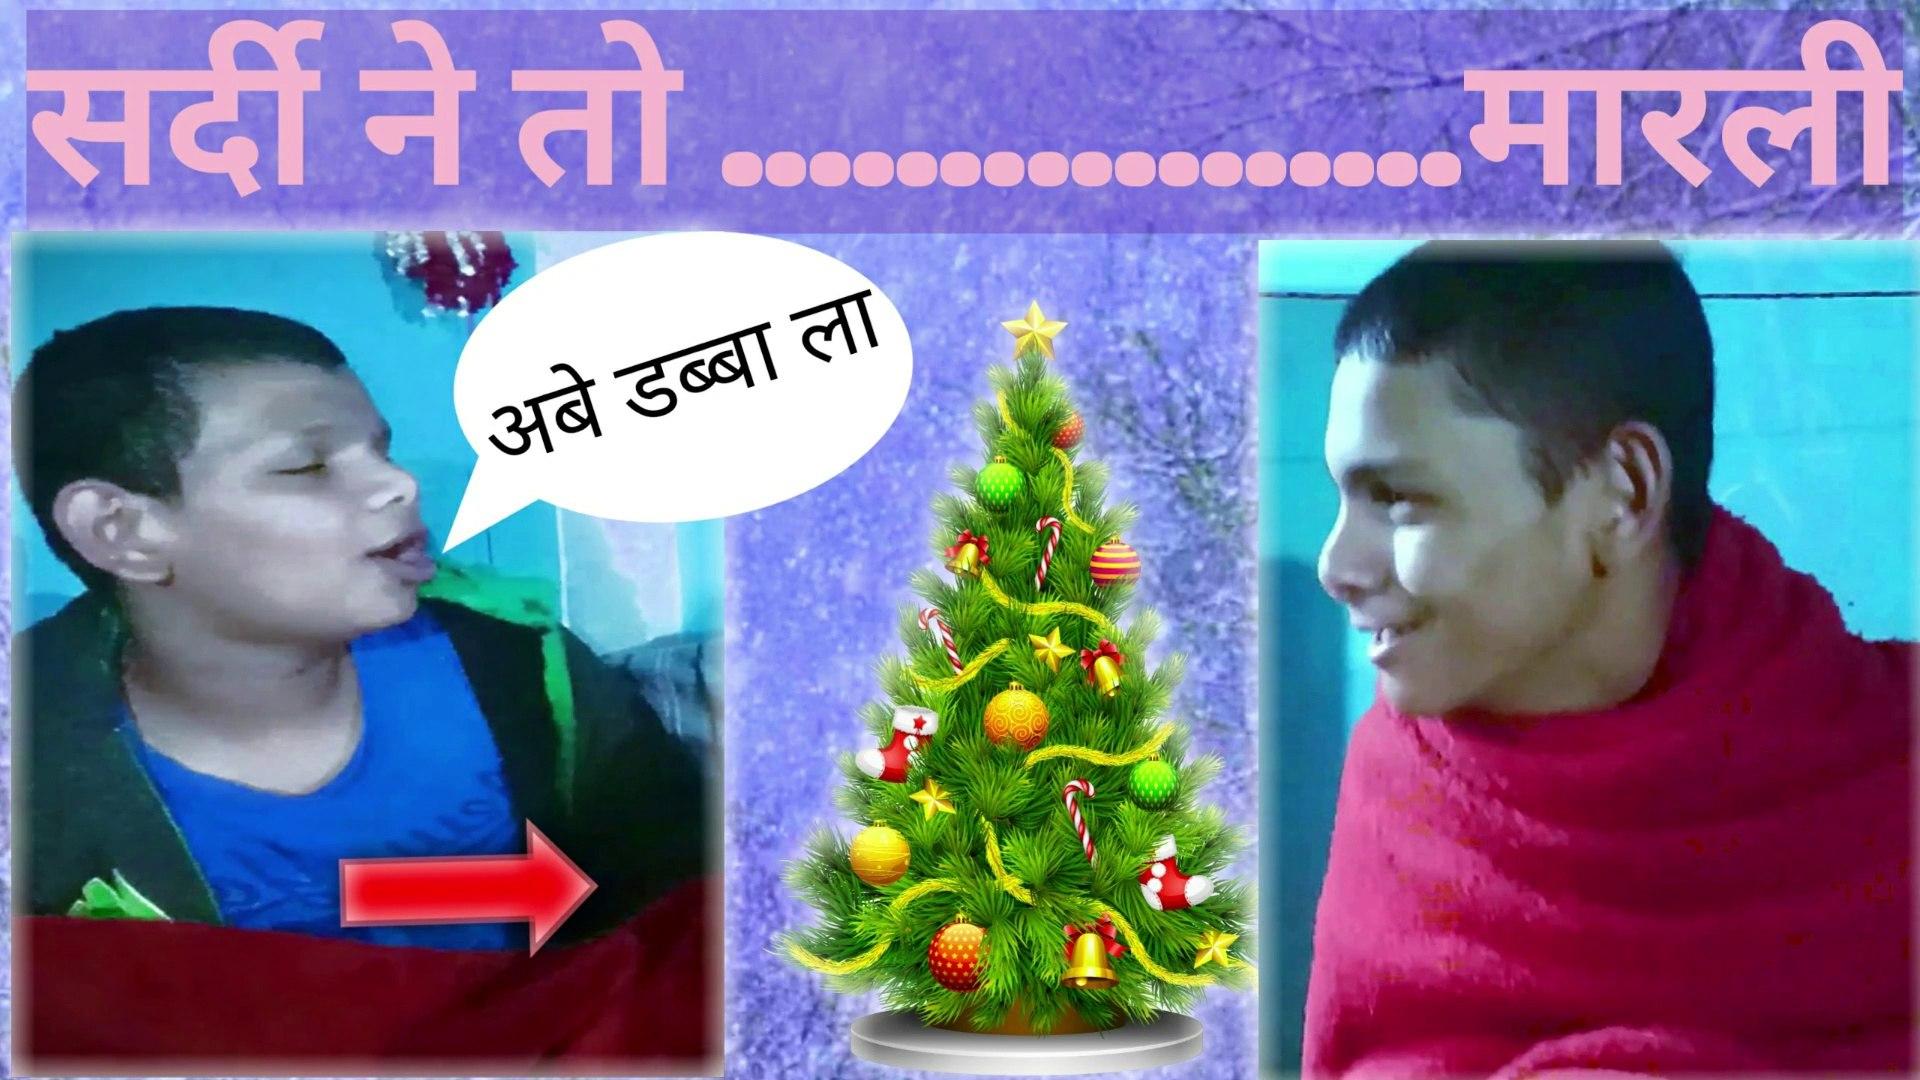 सर्दी ने तो....मारली रे    SARDI KA KEHER    WINTER SPECIAL    TRENDING VIDEO 2020    india entertai